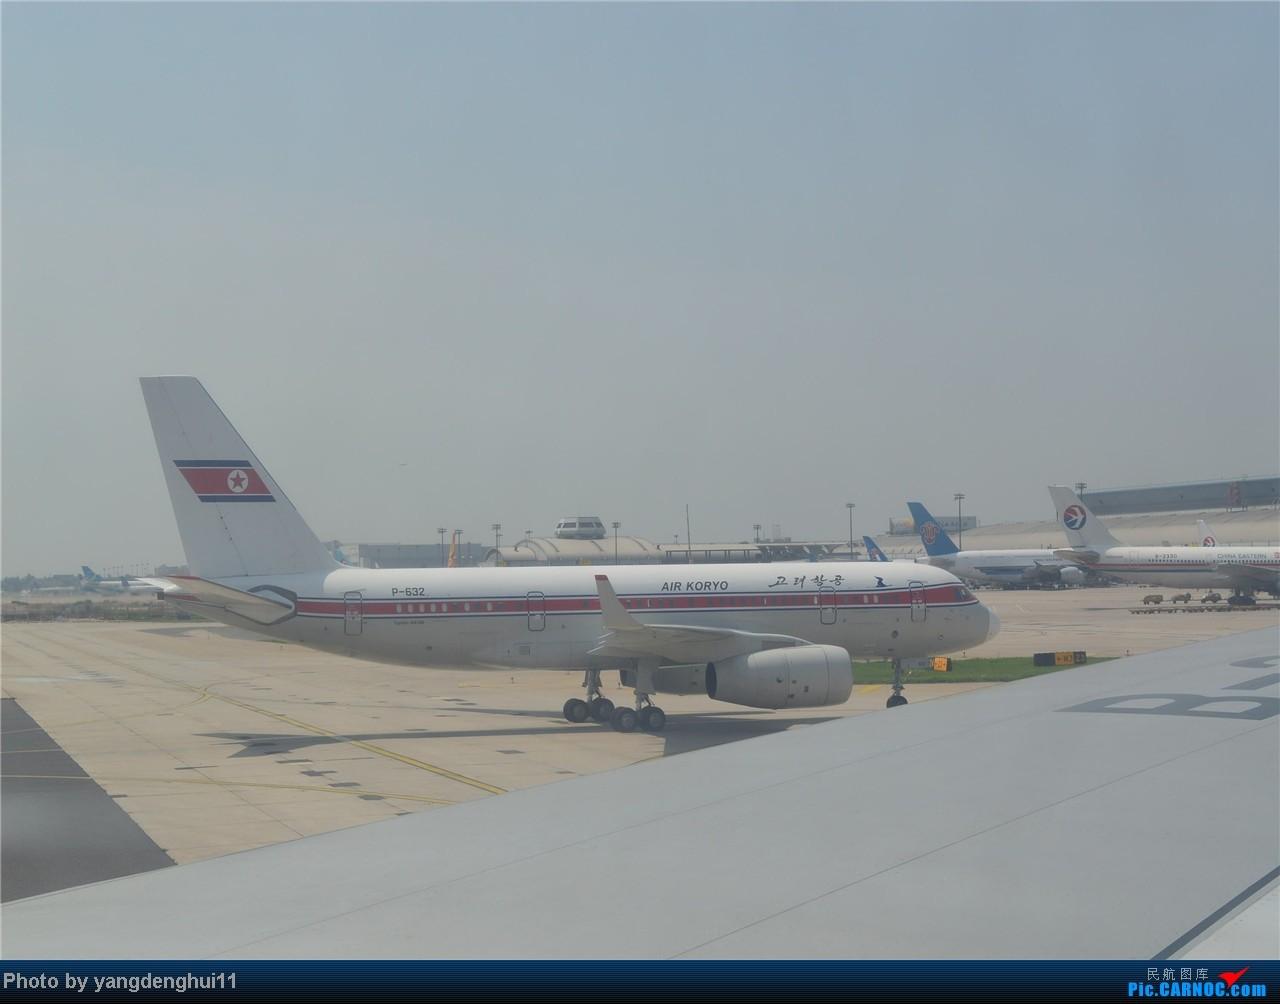 Re:[原创]暑假出游:CTU---PEK---CTU,北京巧遇国航红、蓝凤凰。(上) 。 P-632 中国北京首都机场